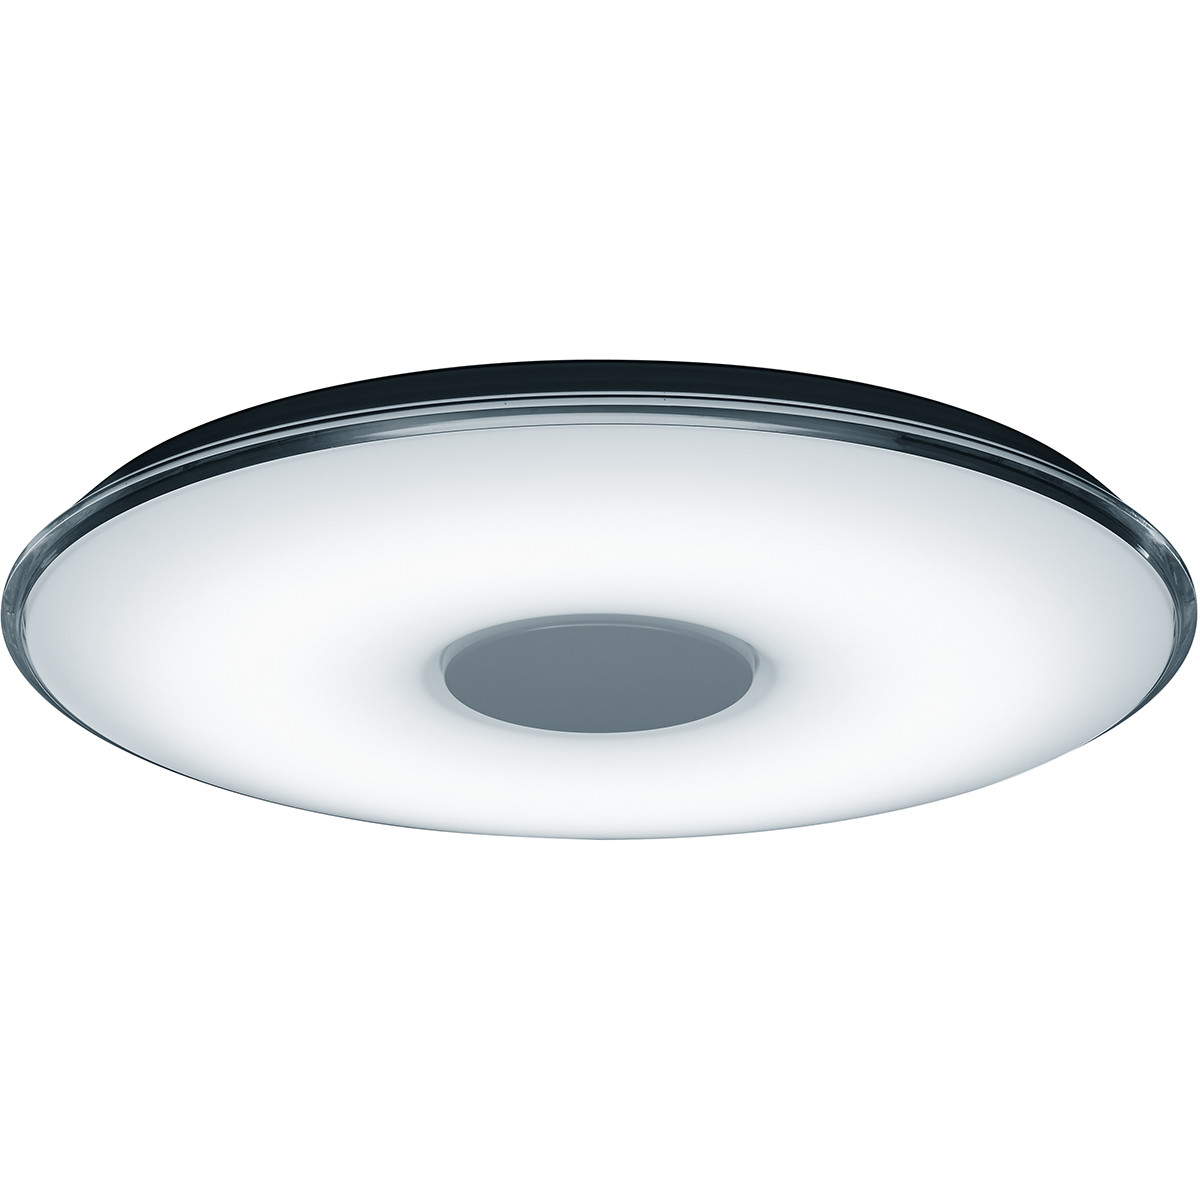 LED Plafondlamp - Trion Tako - 45W - Aanpasbare Kleur - Dimbaar - Afstandsbediening - Rond - Mat Wit